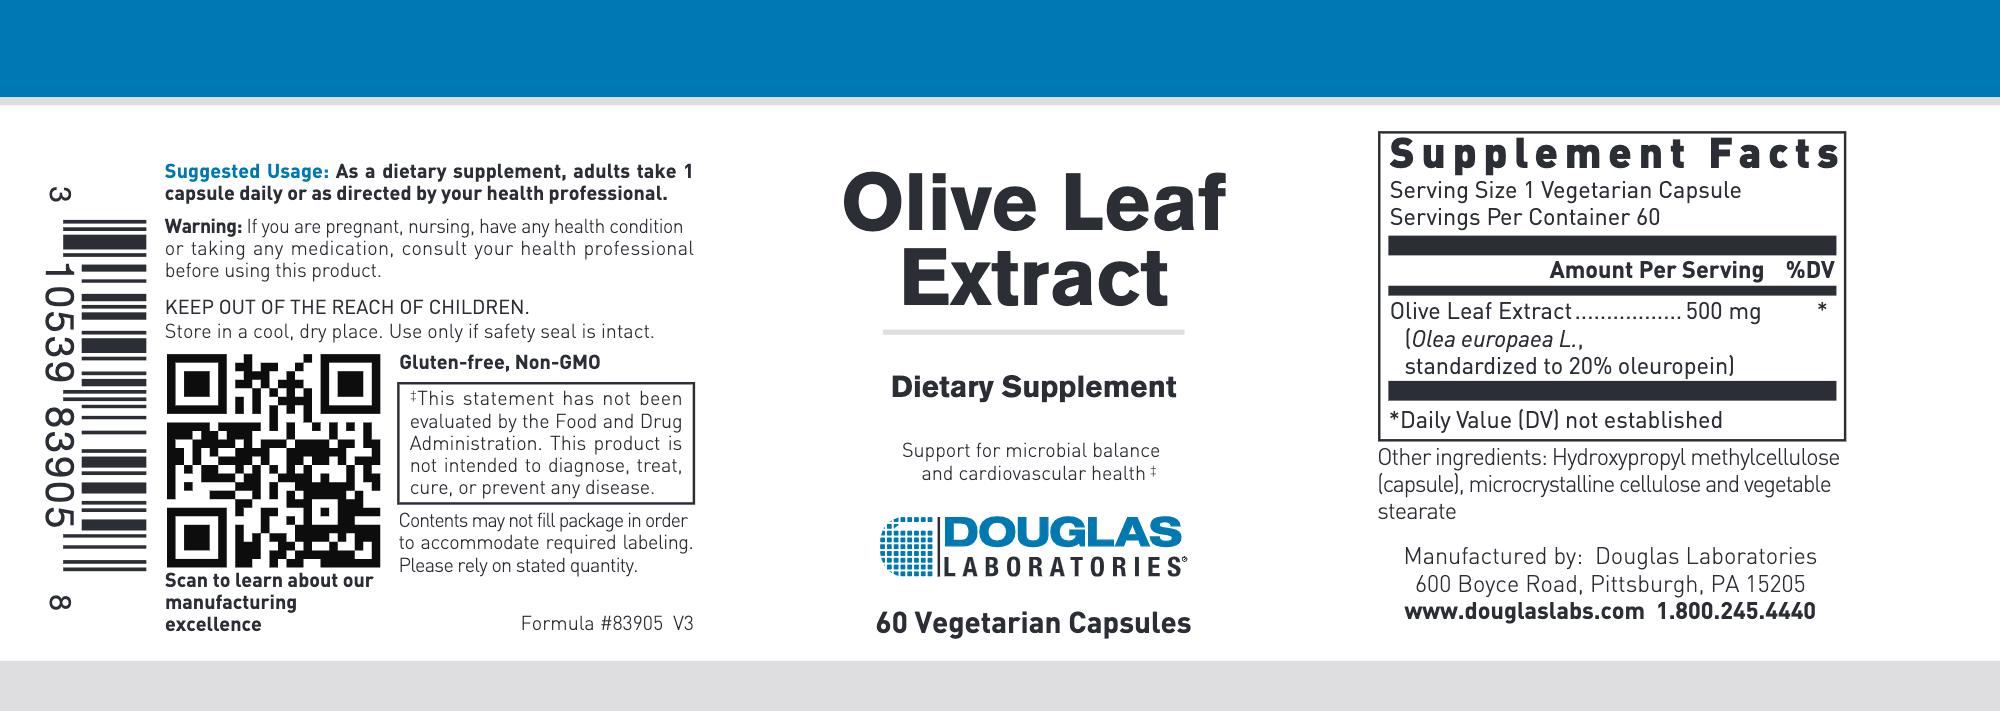 Douglas Laboratories Olive Leaf extract 60 veg caps